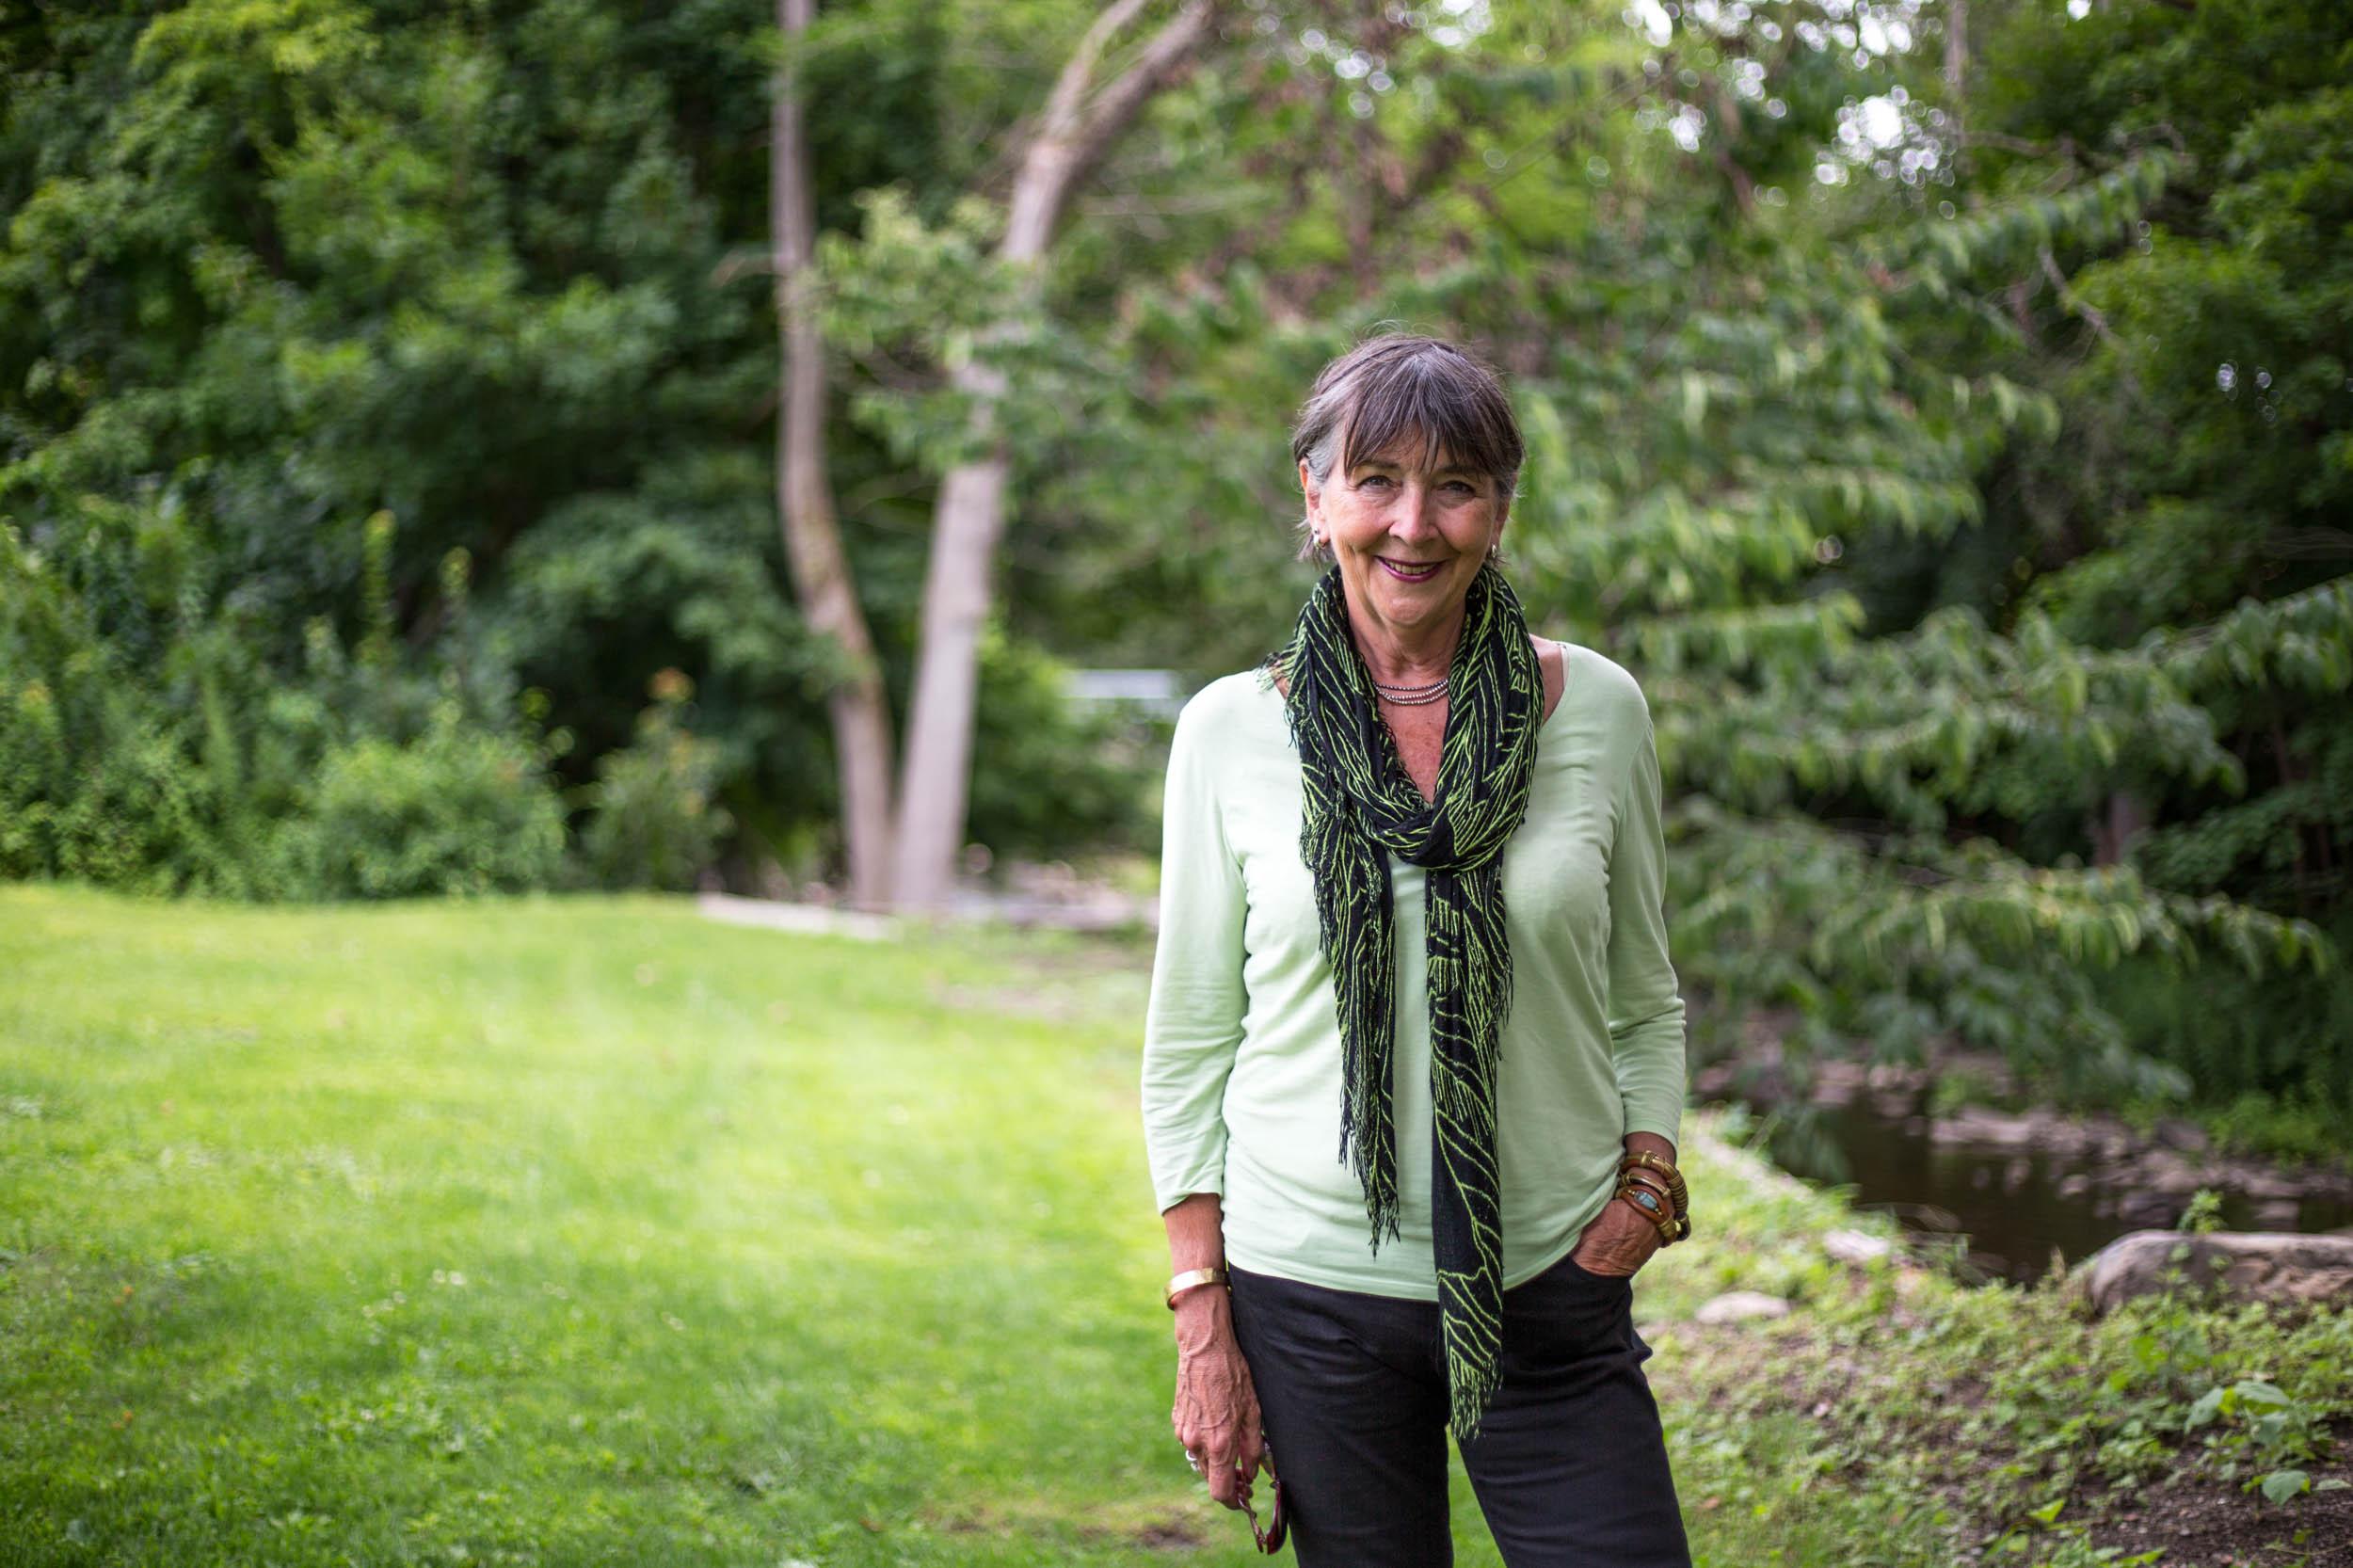 Jennifer Dowley